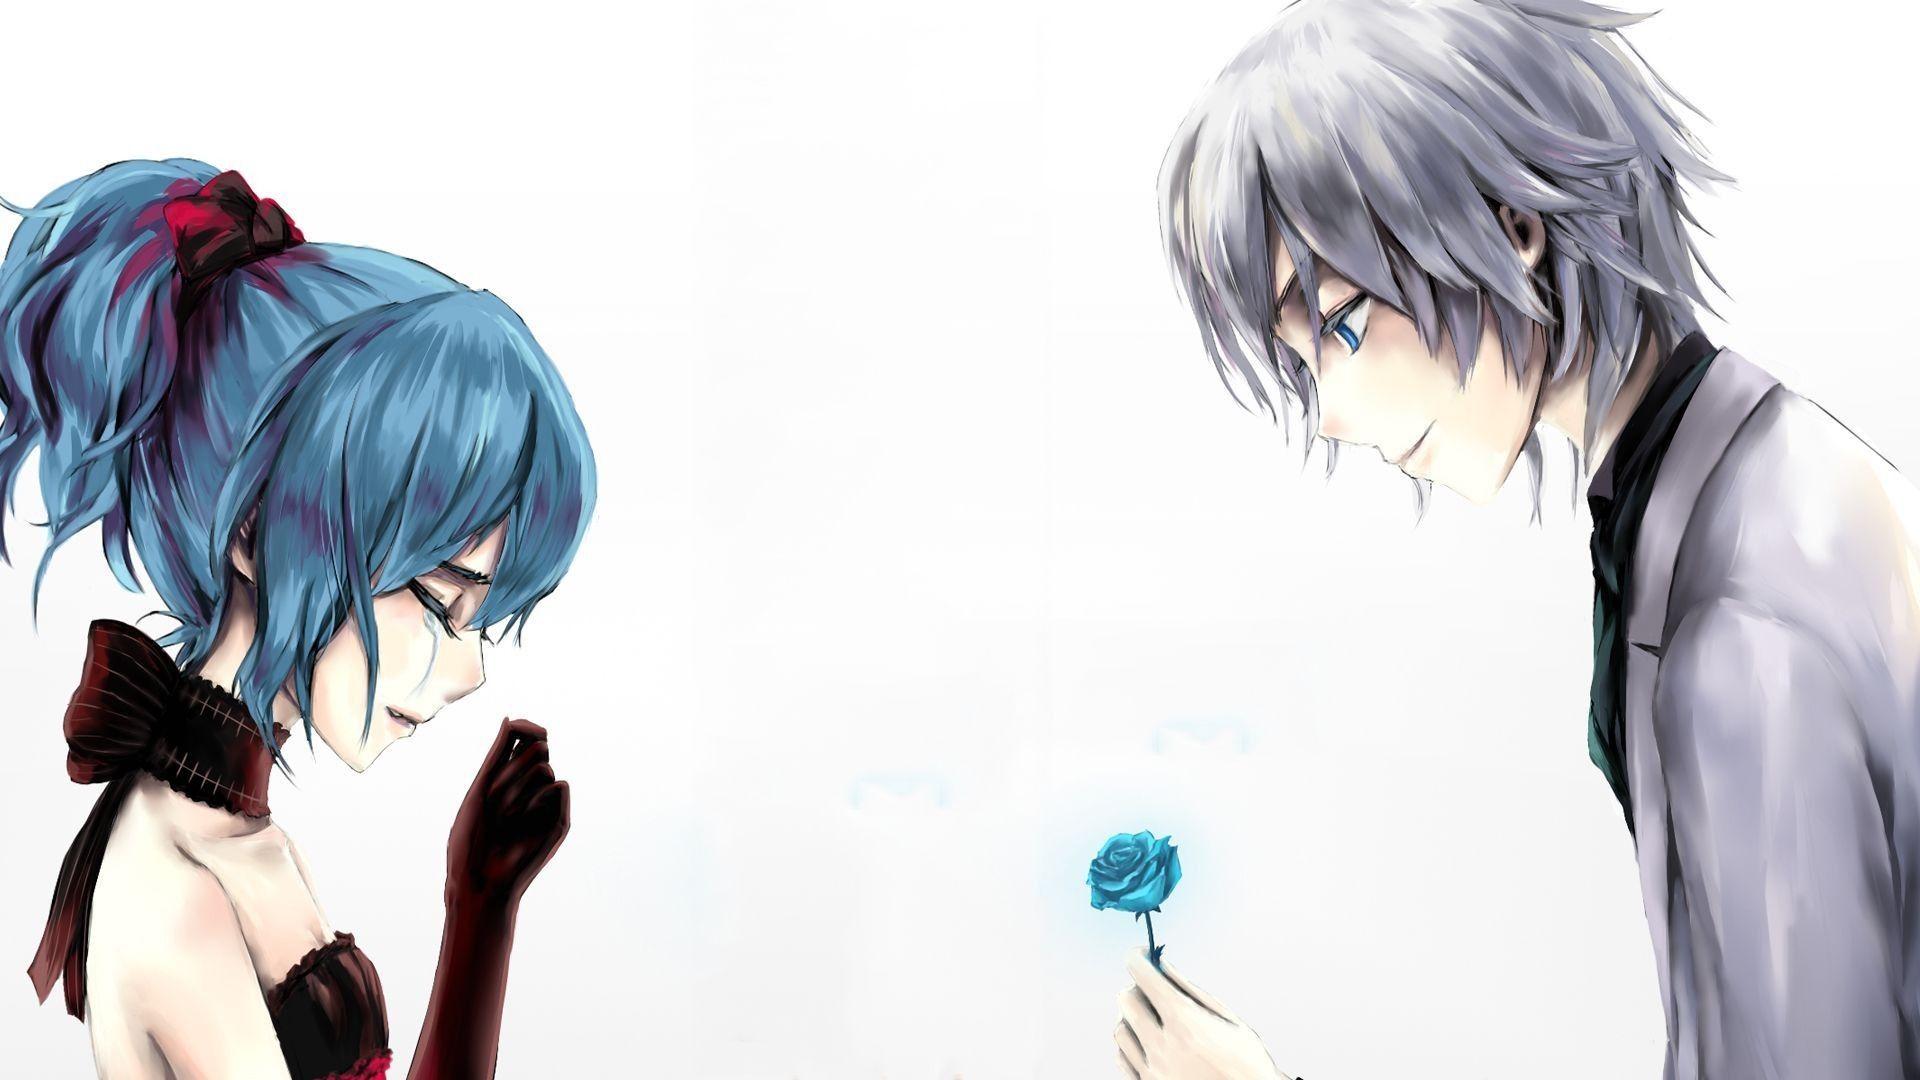 Pin By Yuyita3000 On Anime Just Love Anime Love Couple Anime Hd Anime Wallpapers